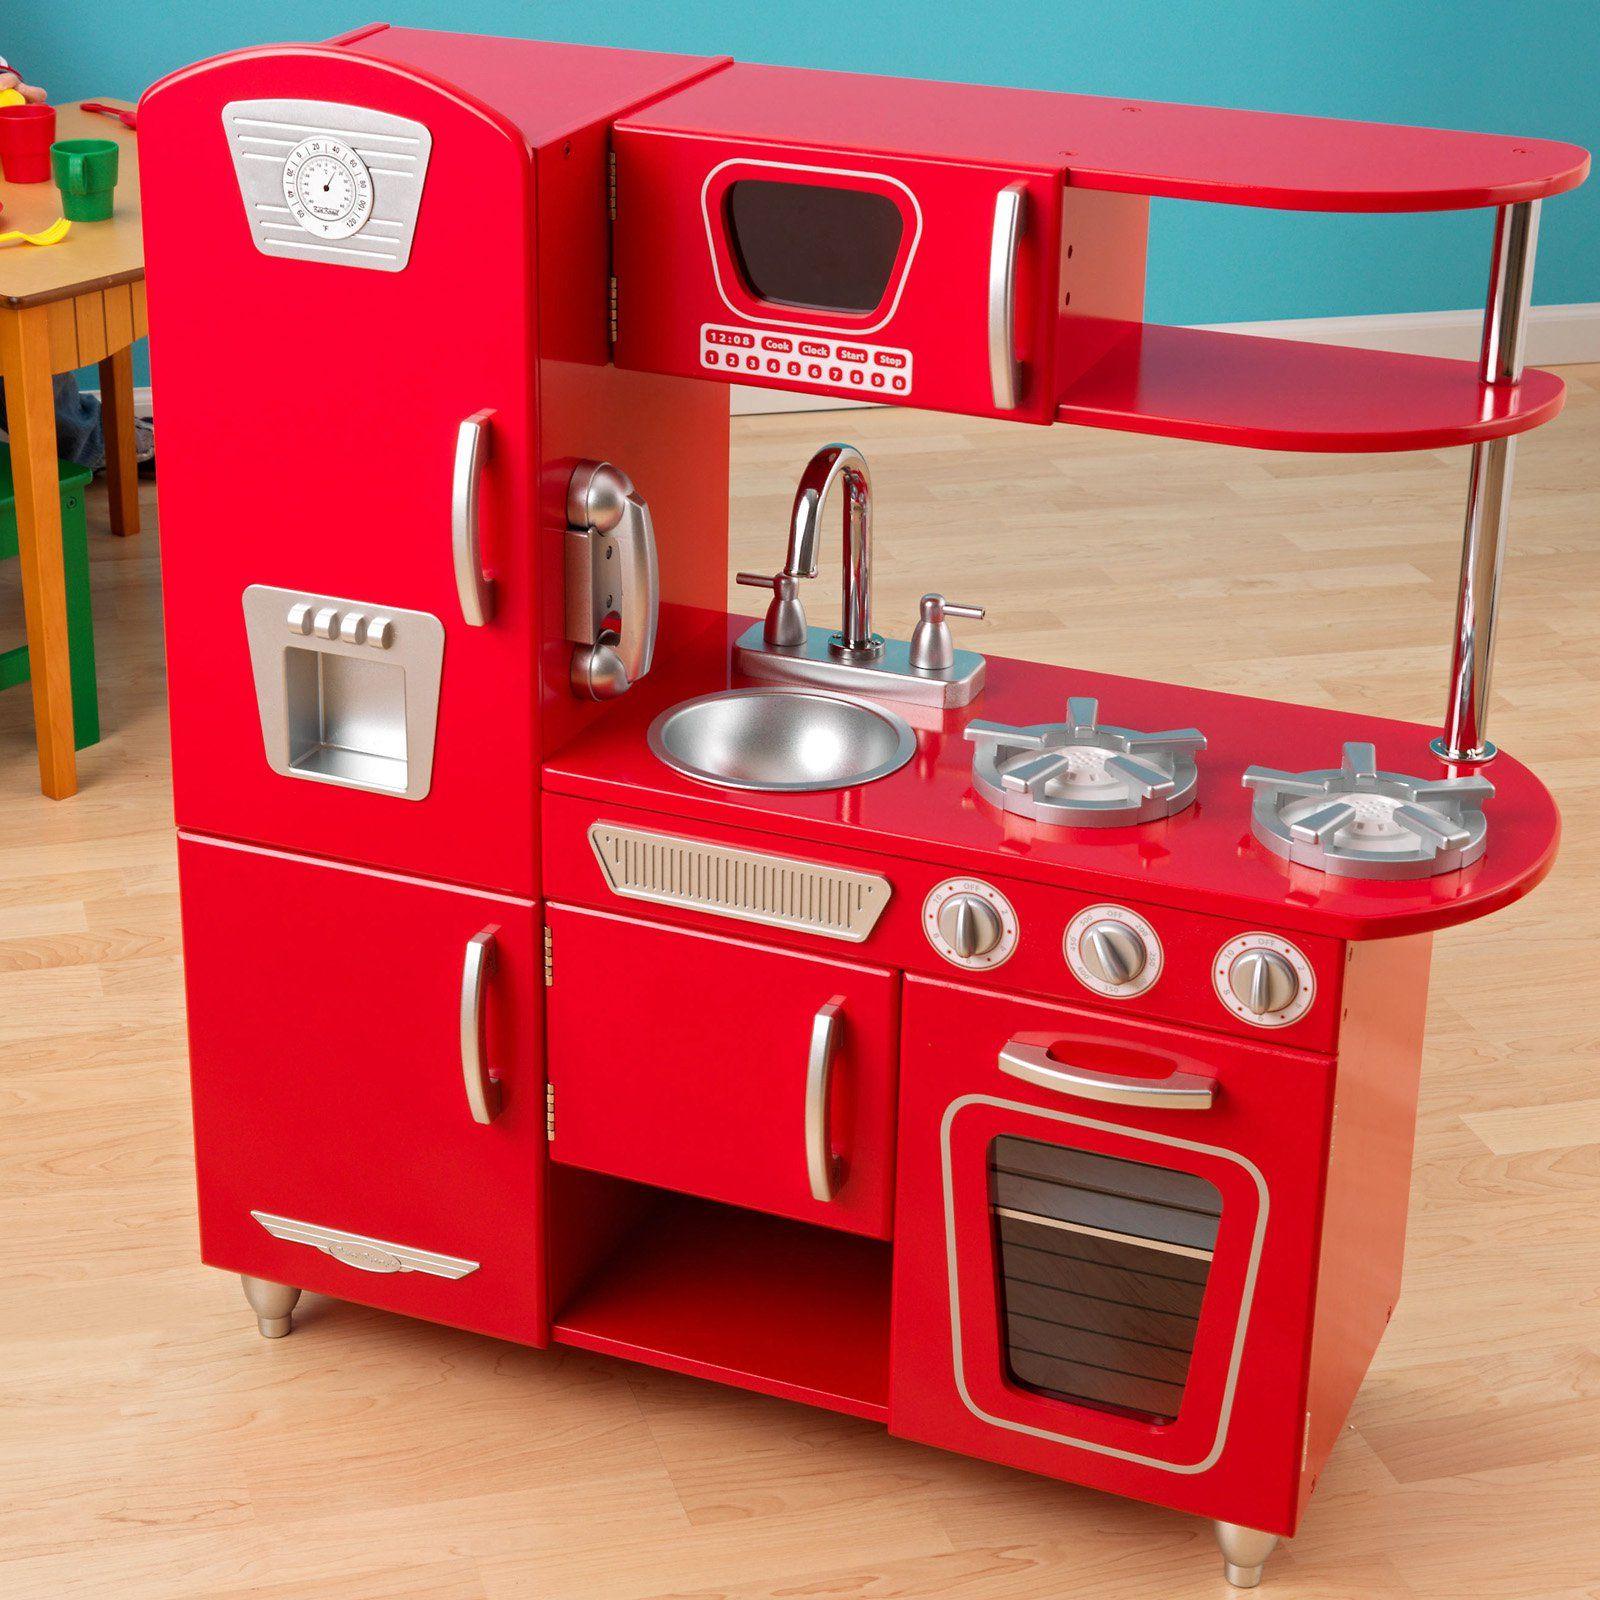 kidkraft red vintage play kitchen 53173 53173 products rh pinterest co uk KidKraft Retro Kitchen and Refrigerator KidKraft Classic Kitchen